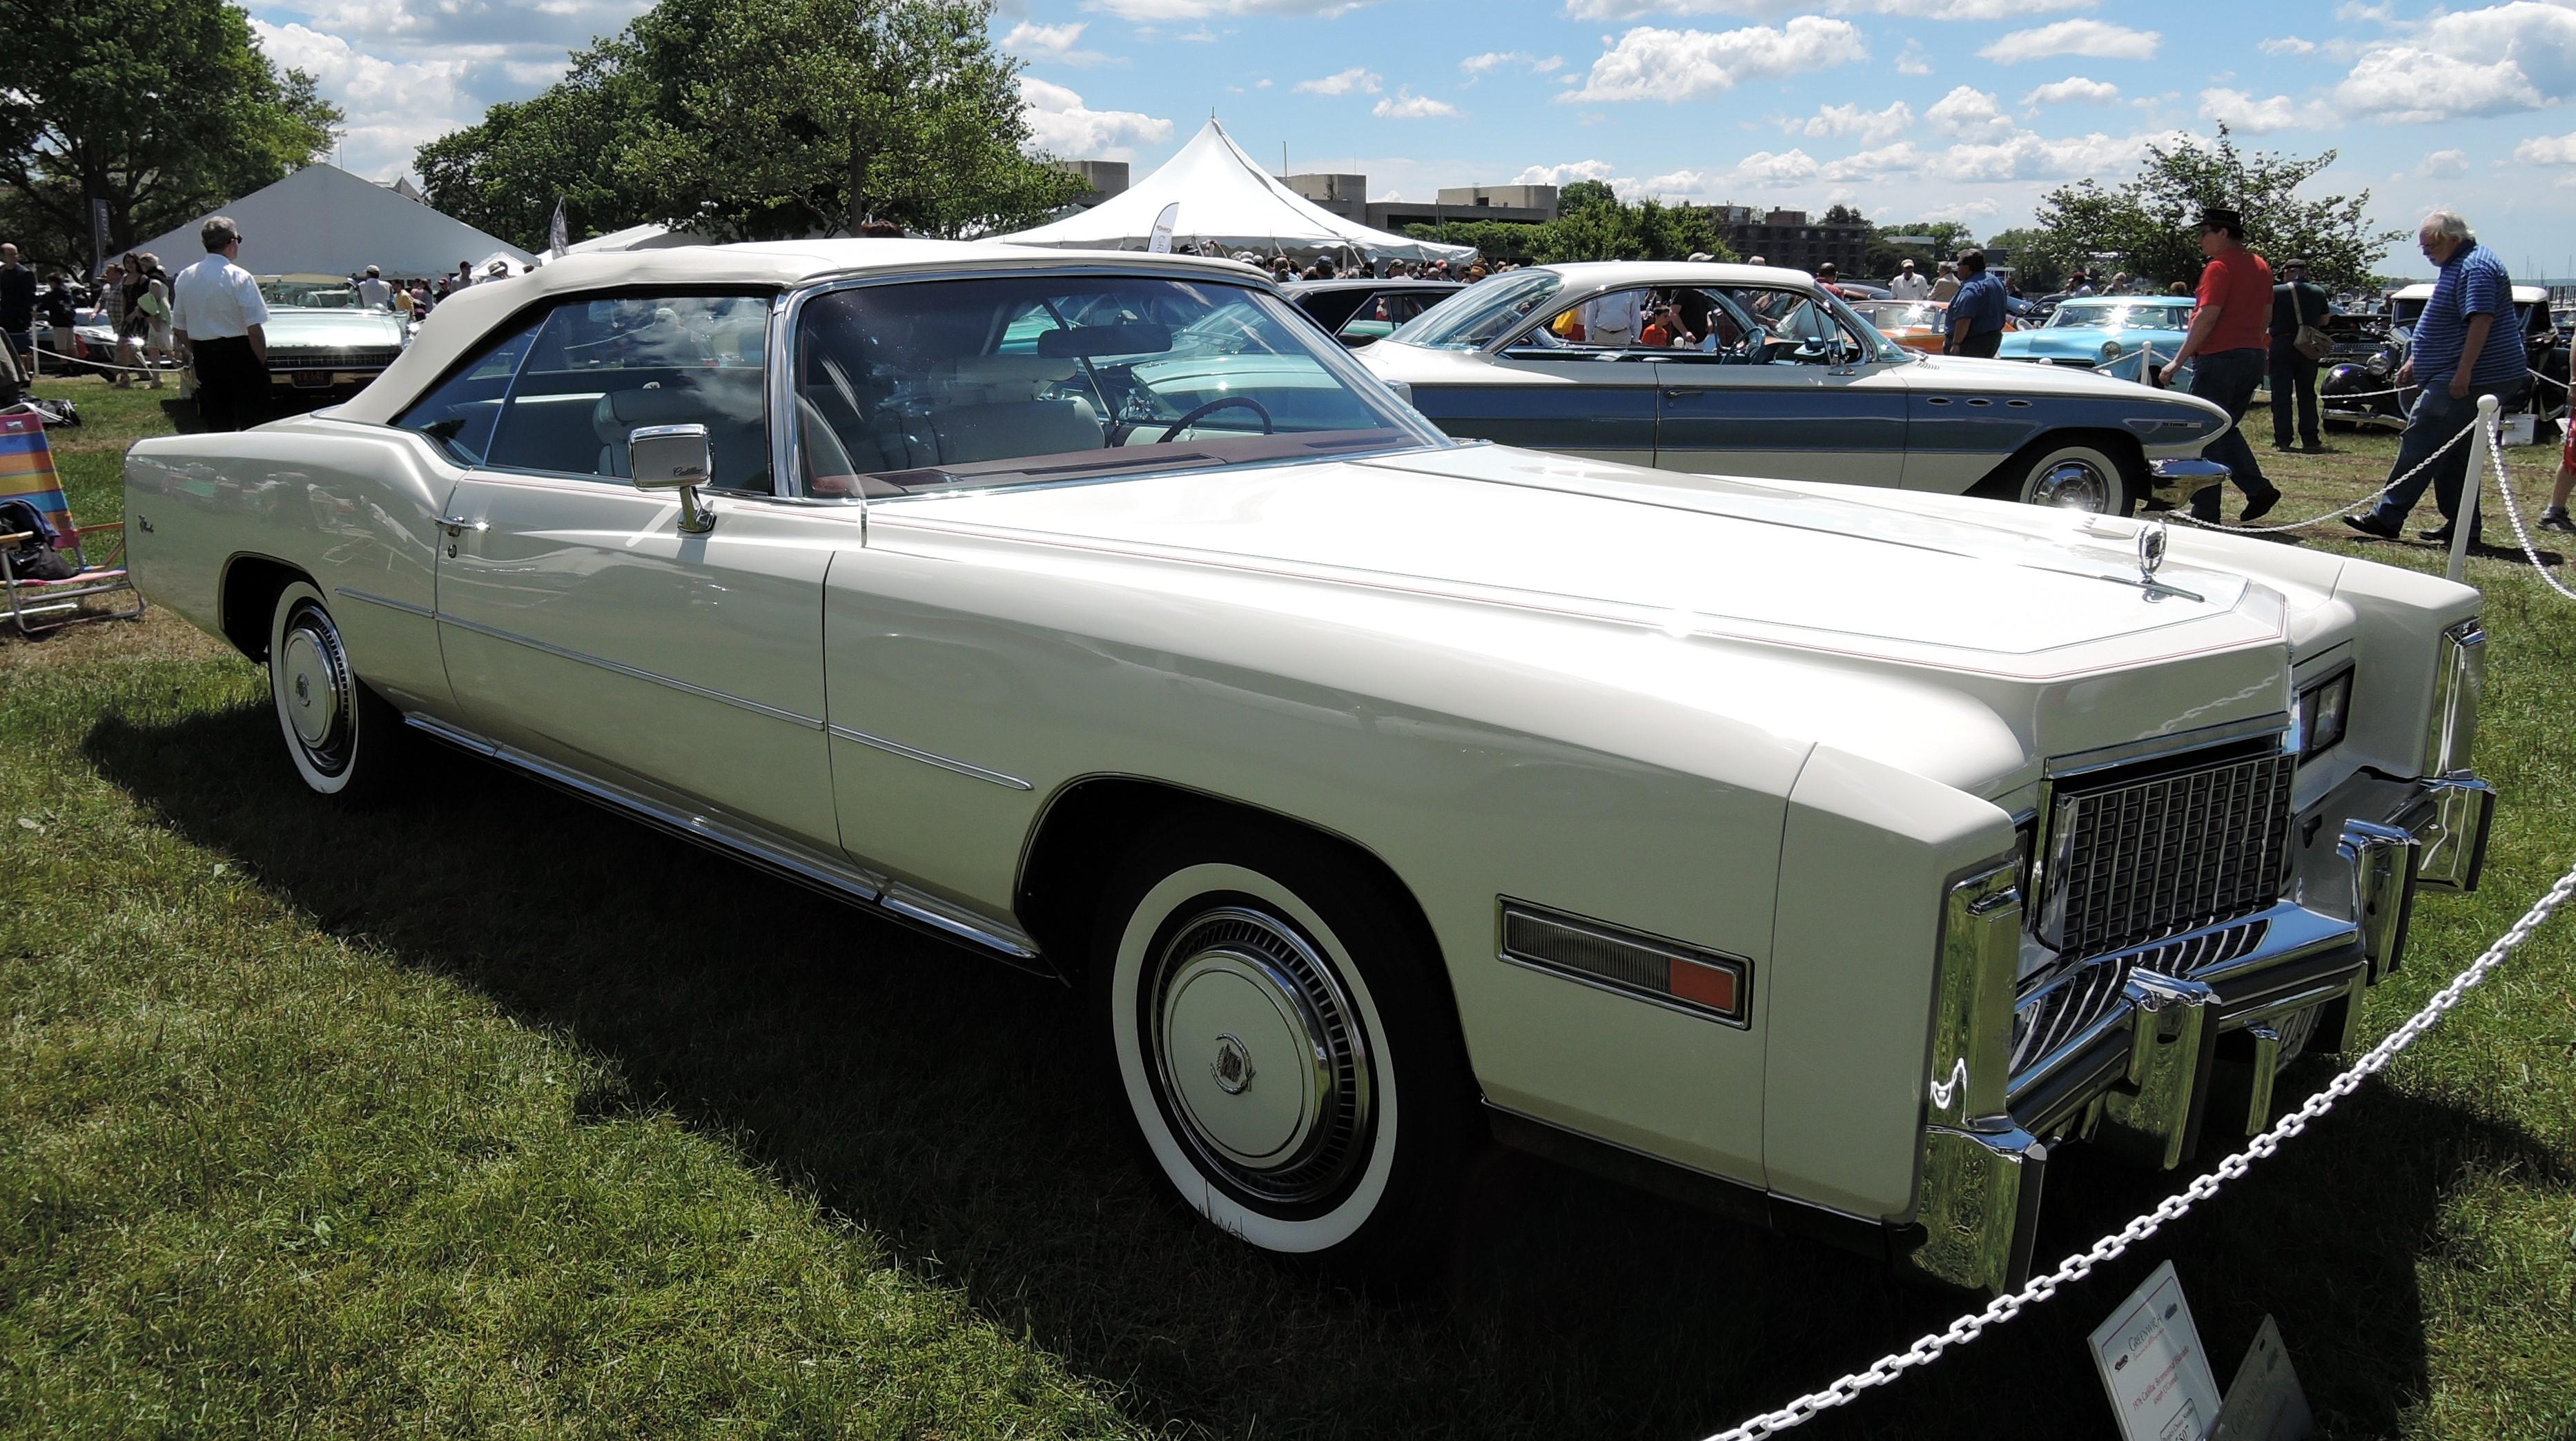 white 1976 Cadillac Bicentennial Eldorado - Greenwich Concours d'Elegance 2017